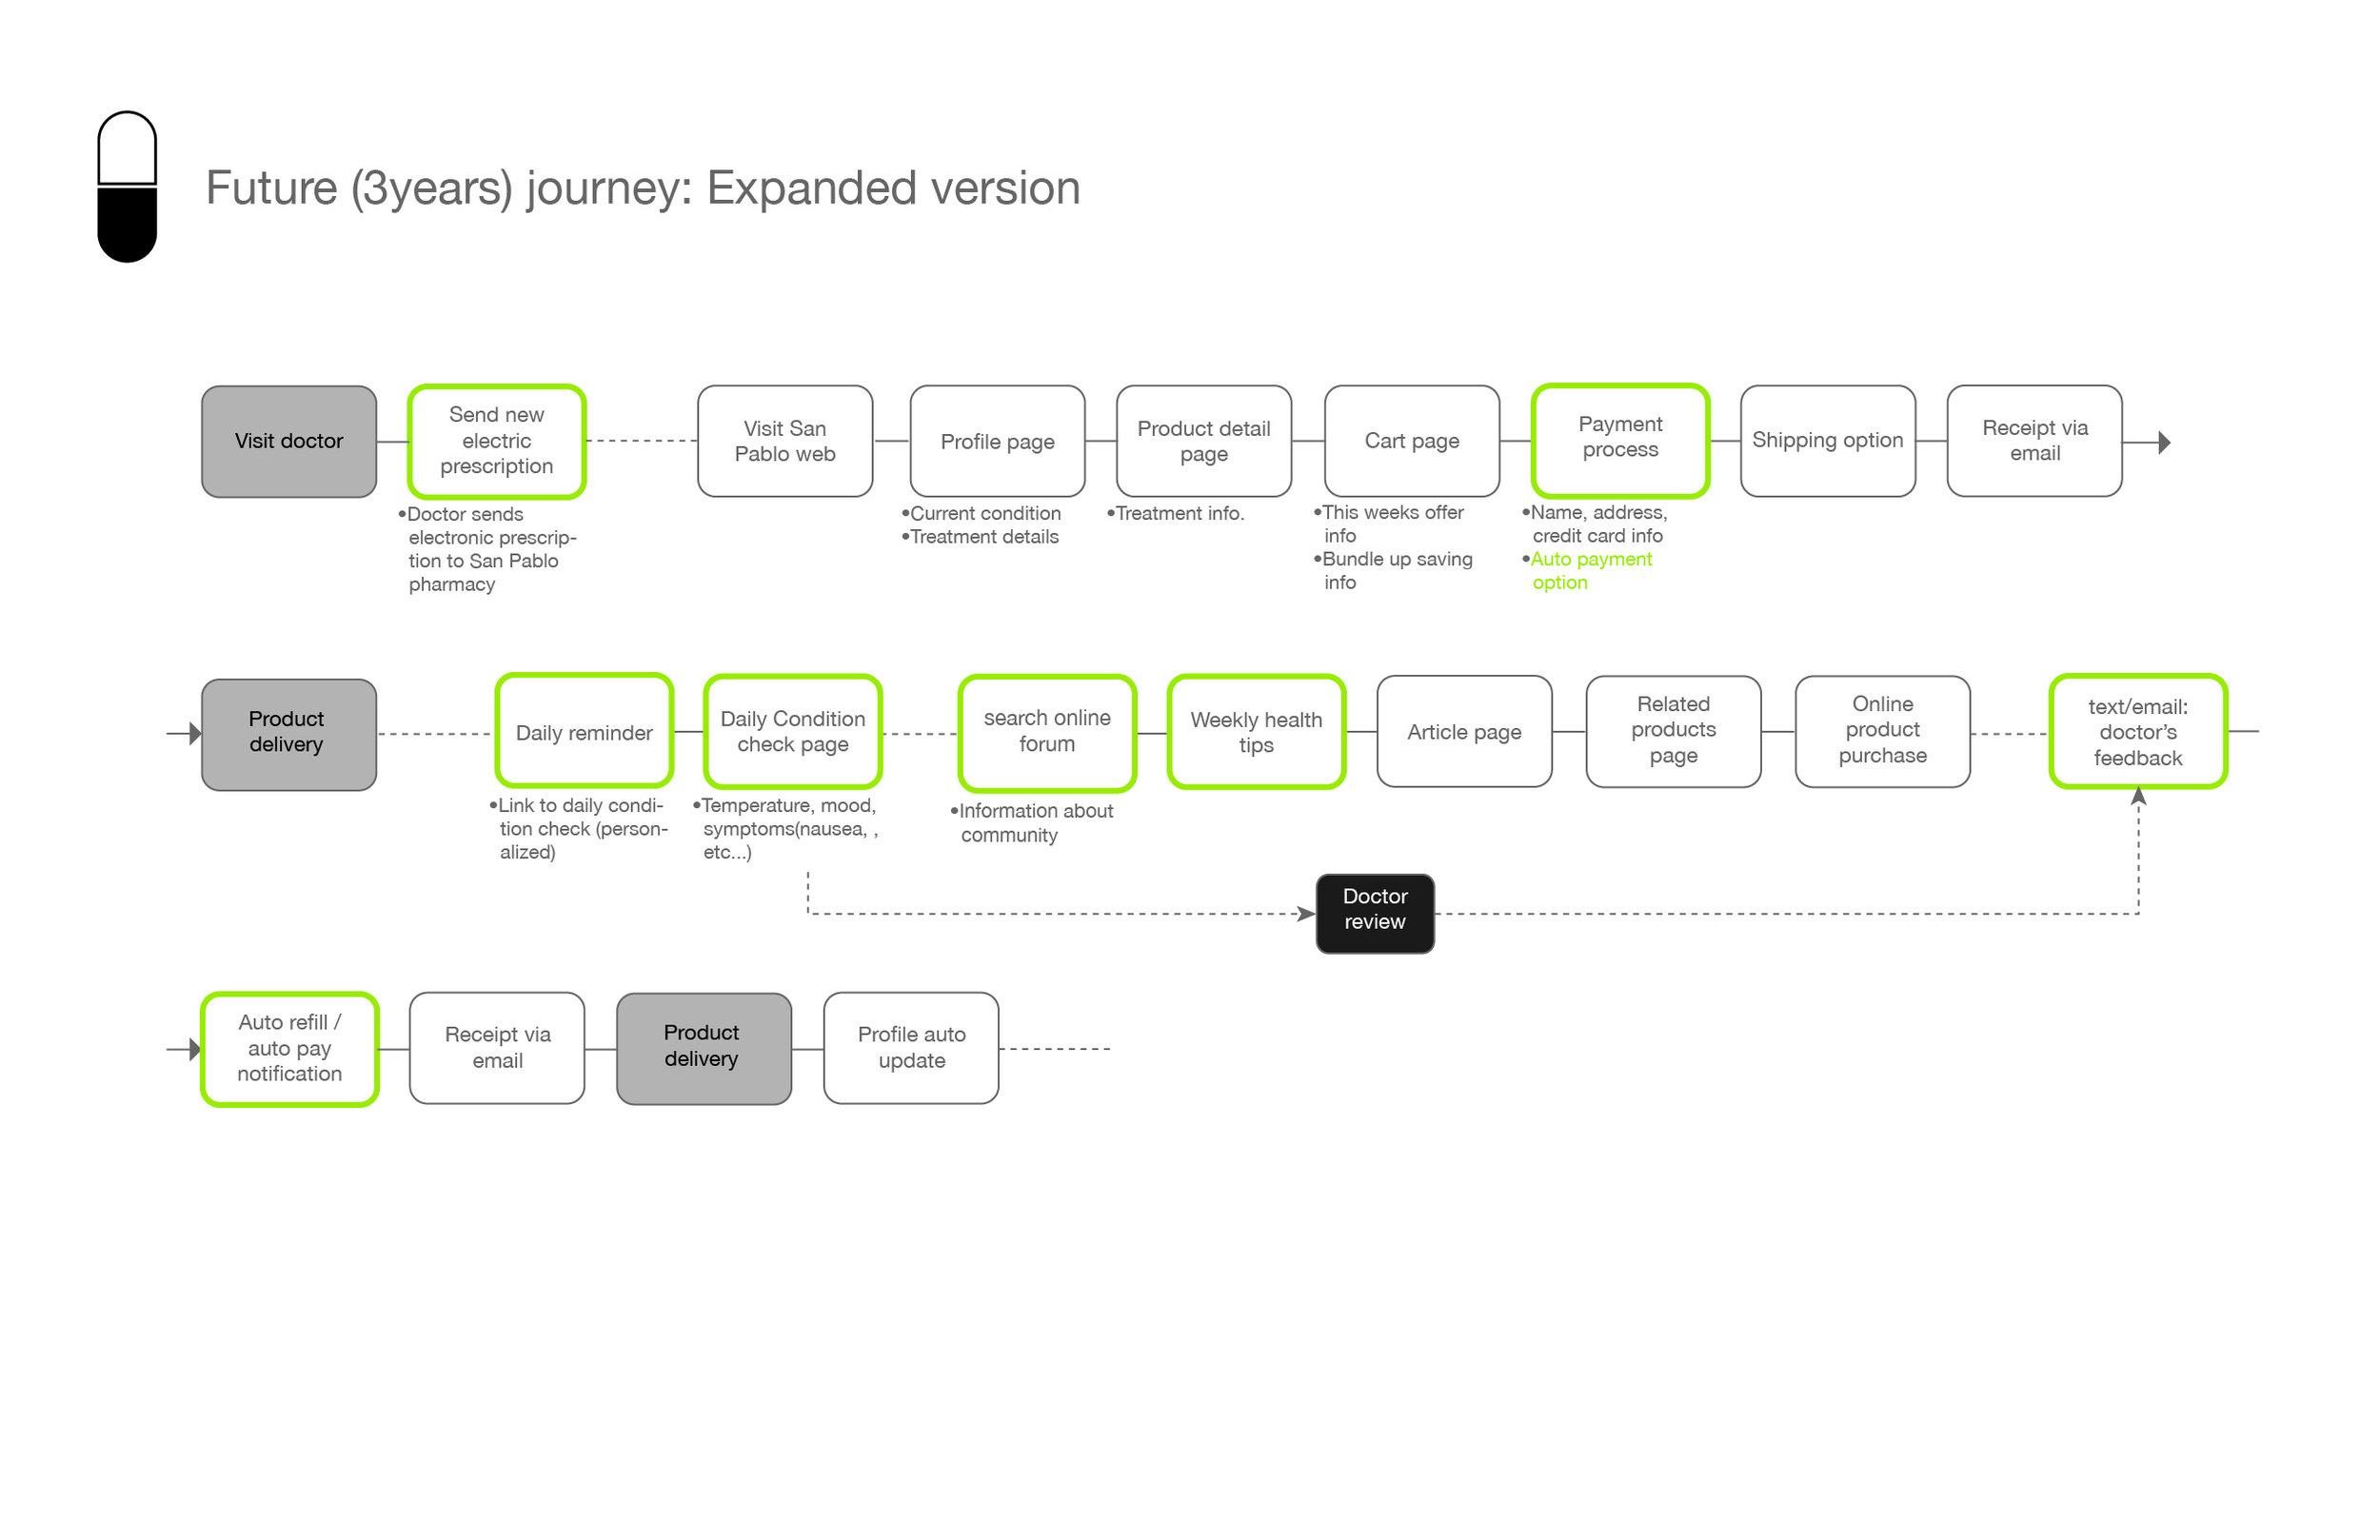 San Pablo Persona+consumer journey_chronic journey copy.jpg